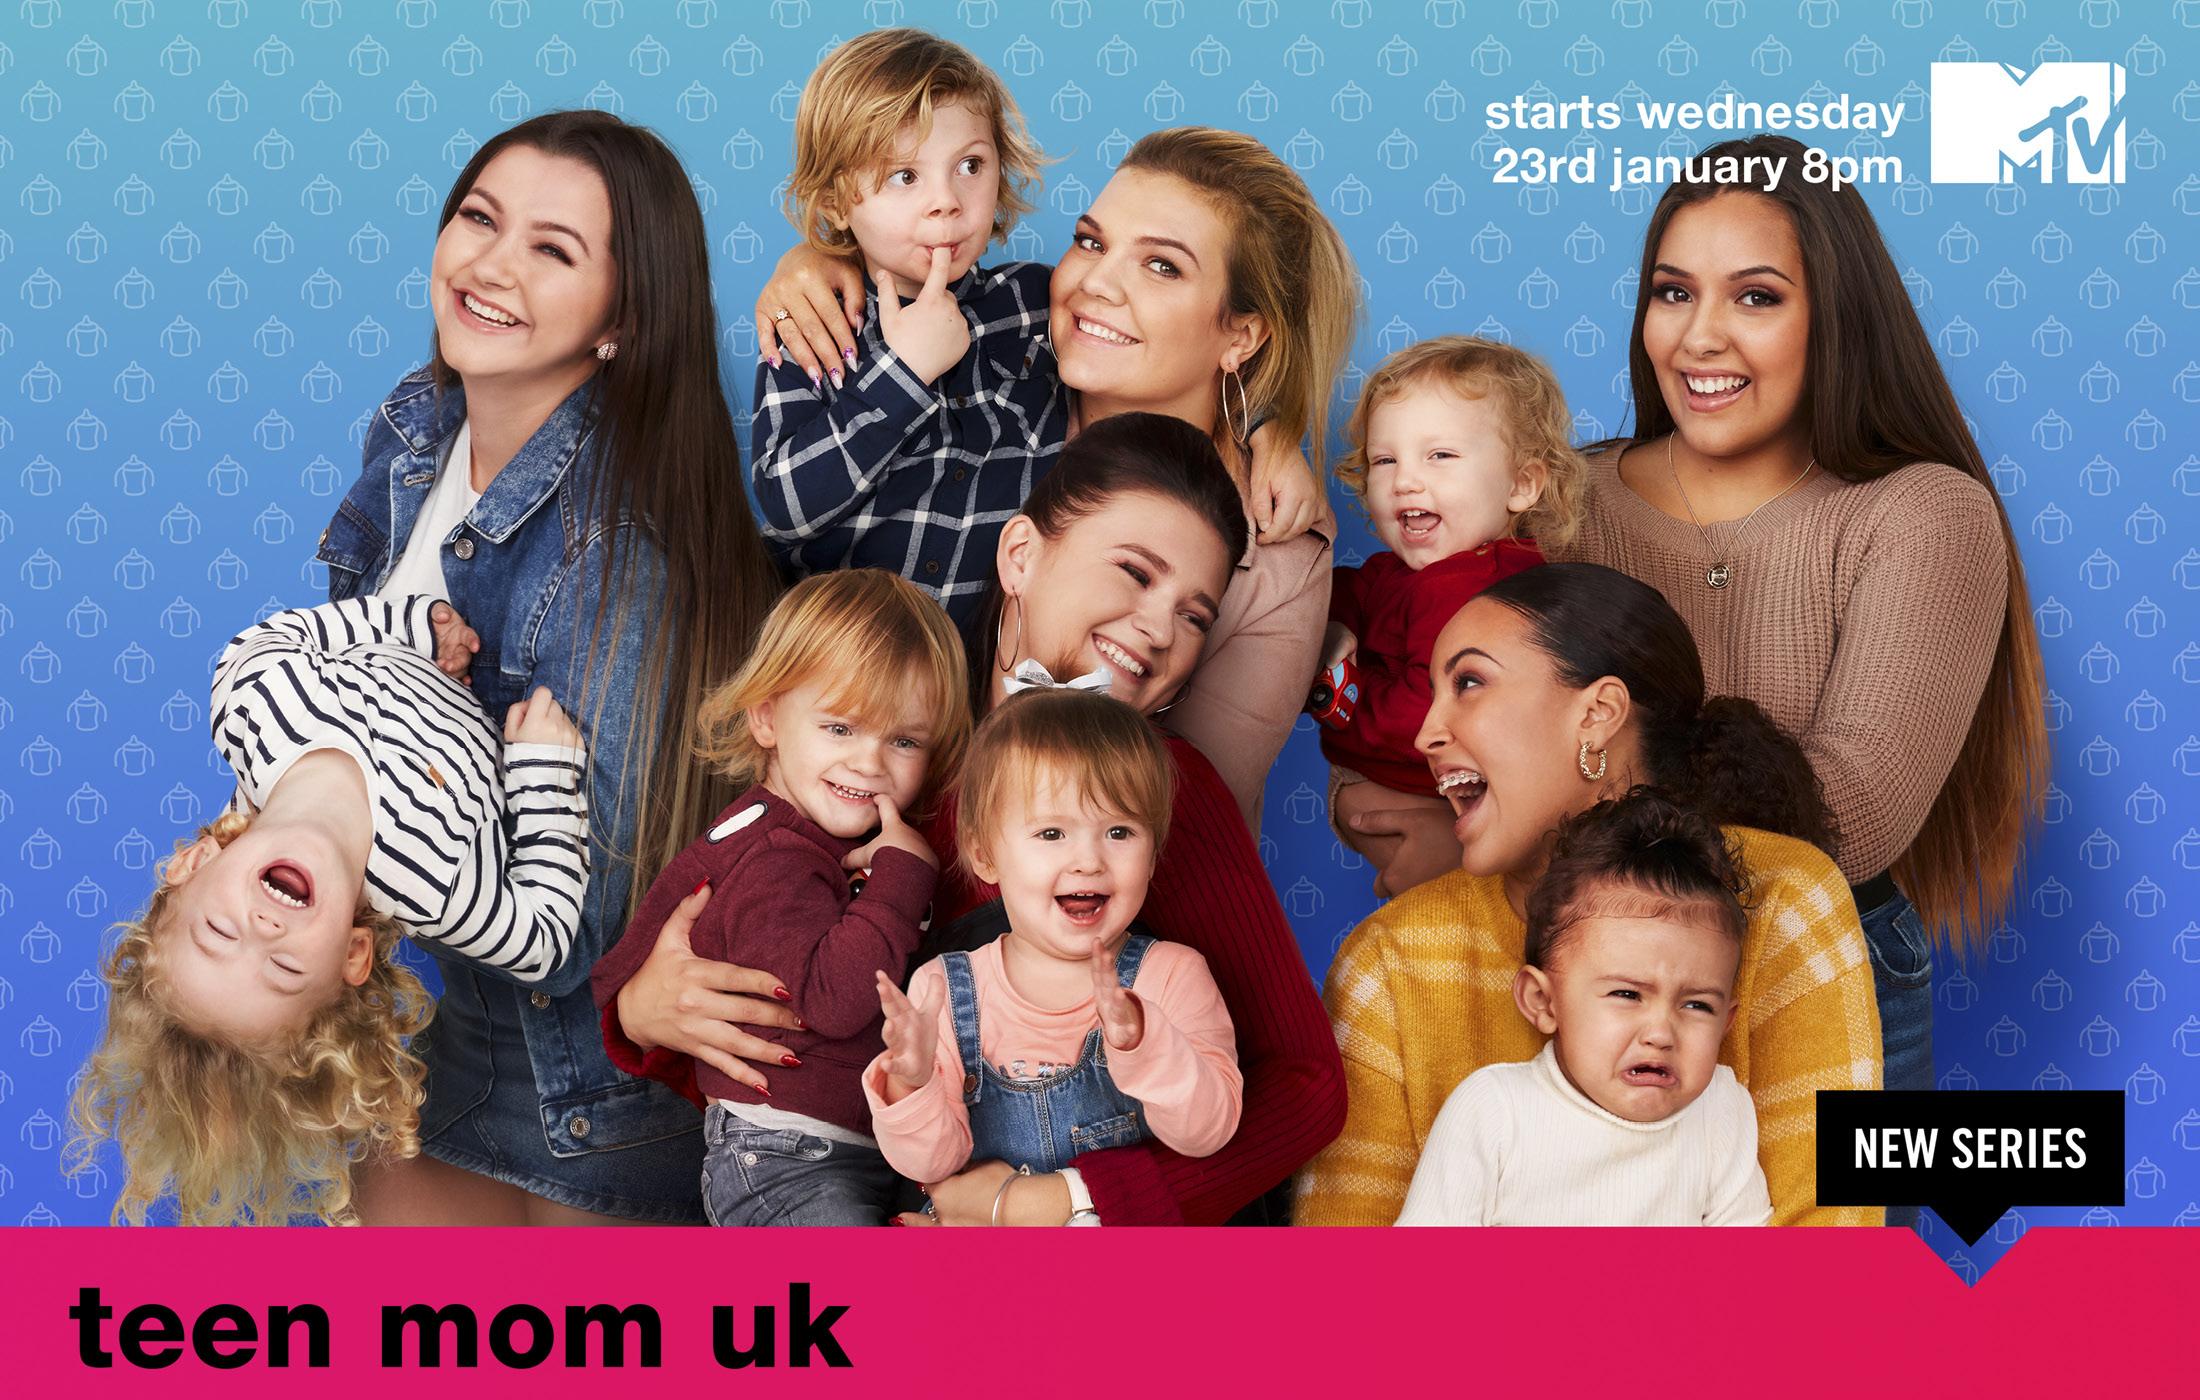 MTV's Teen Mom - Key Art Campaign